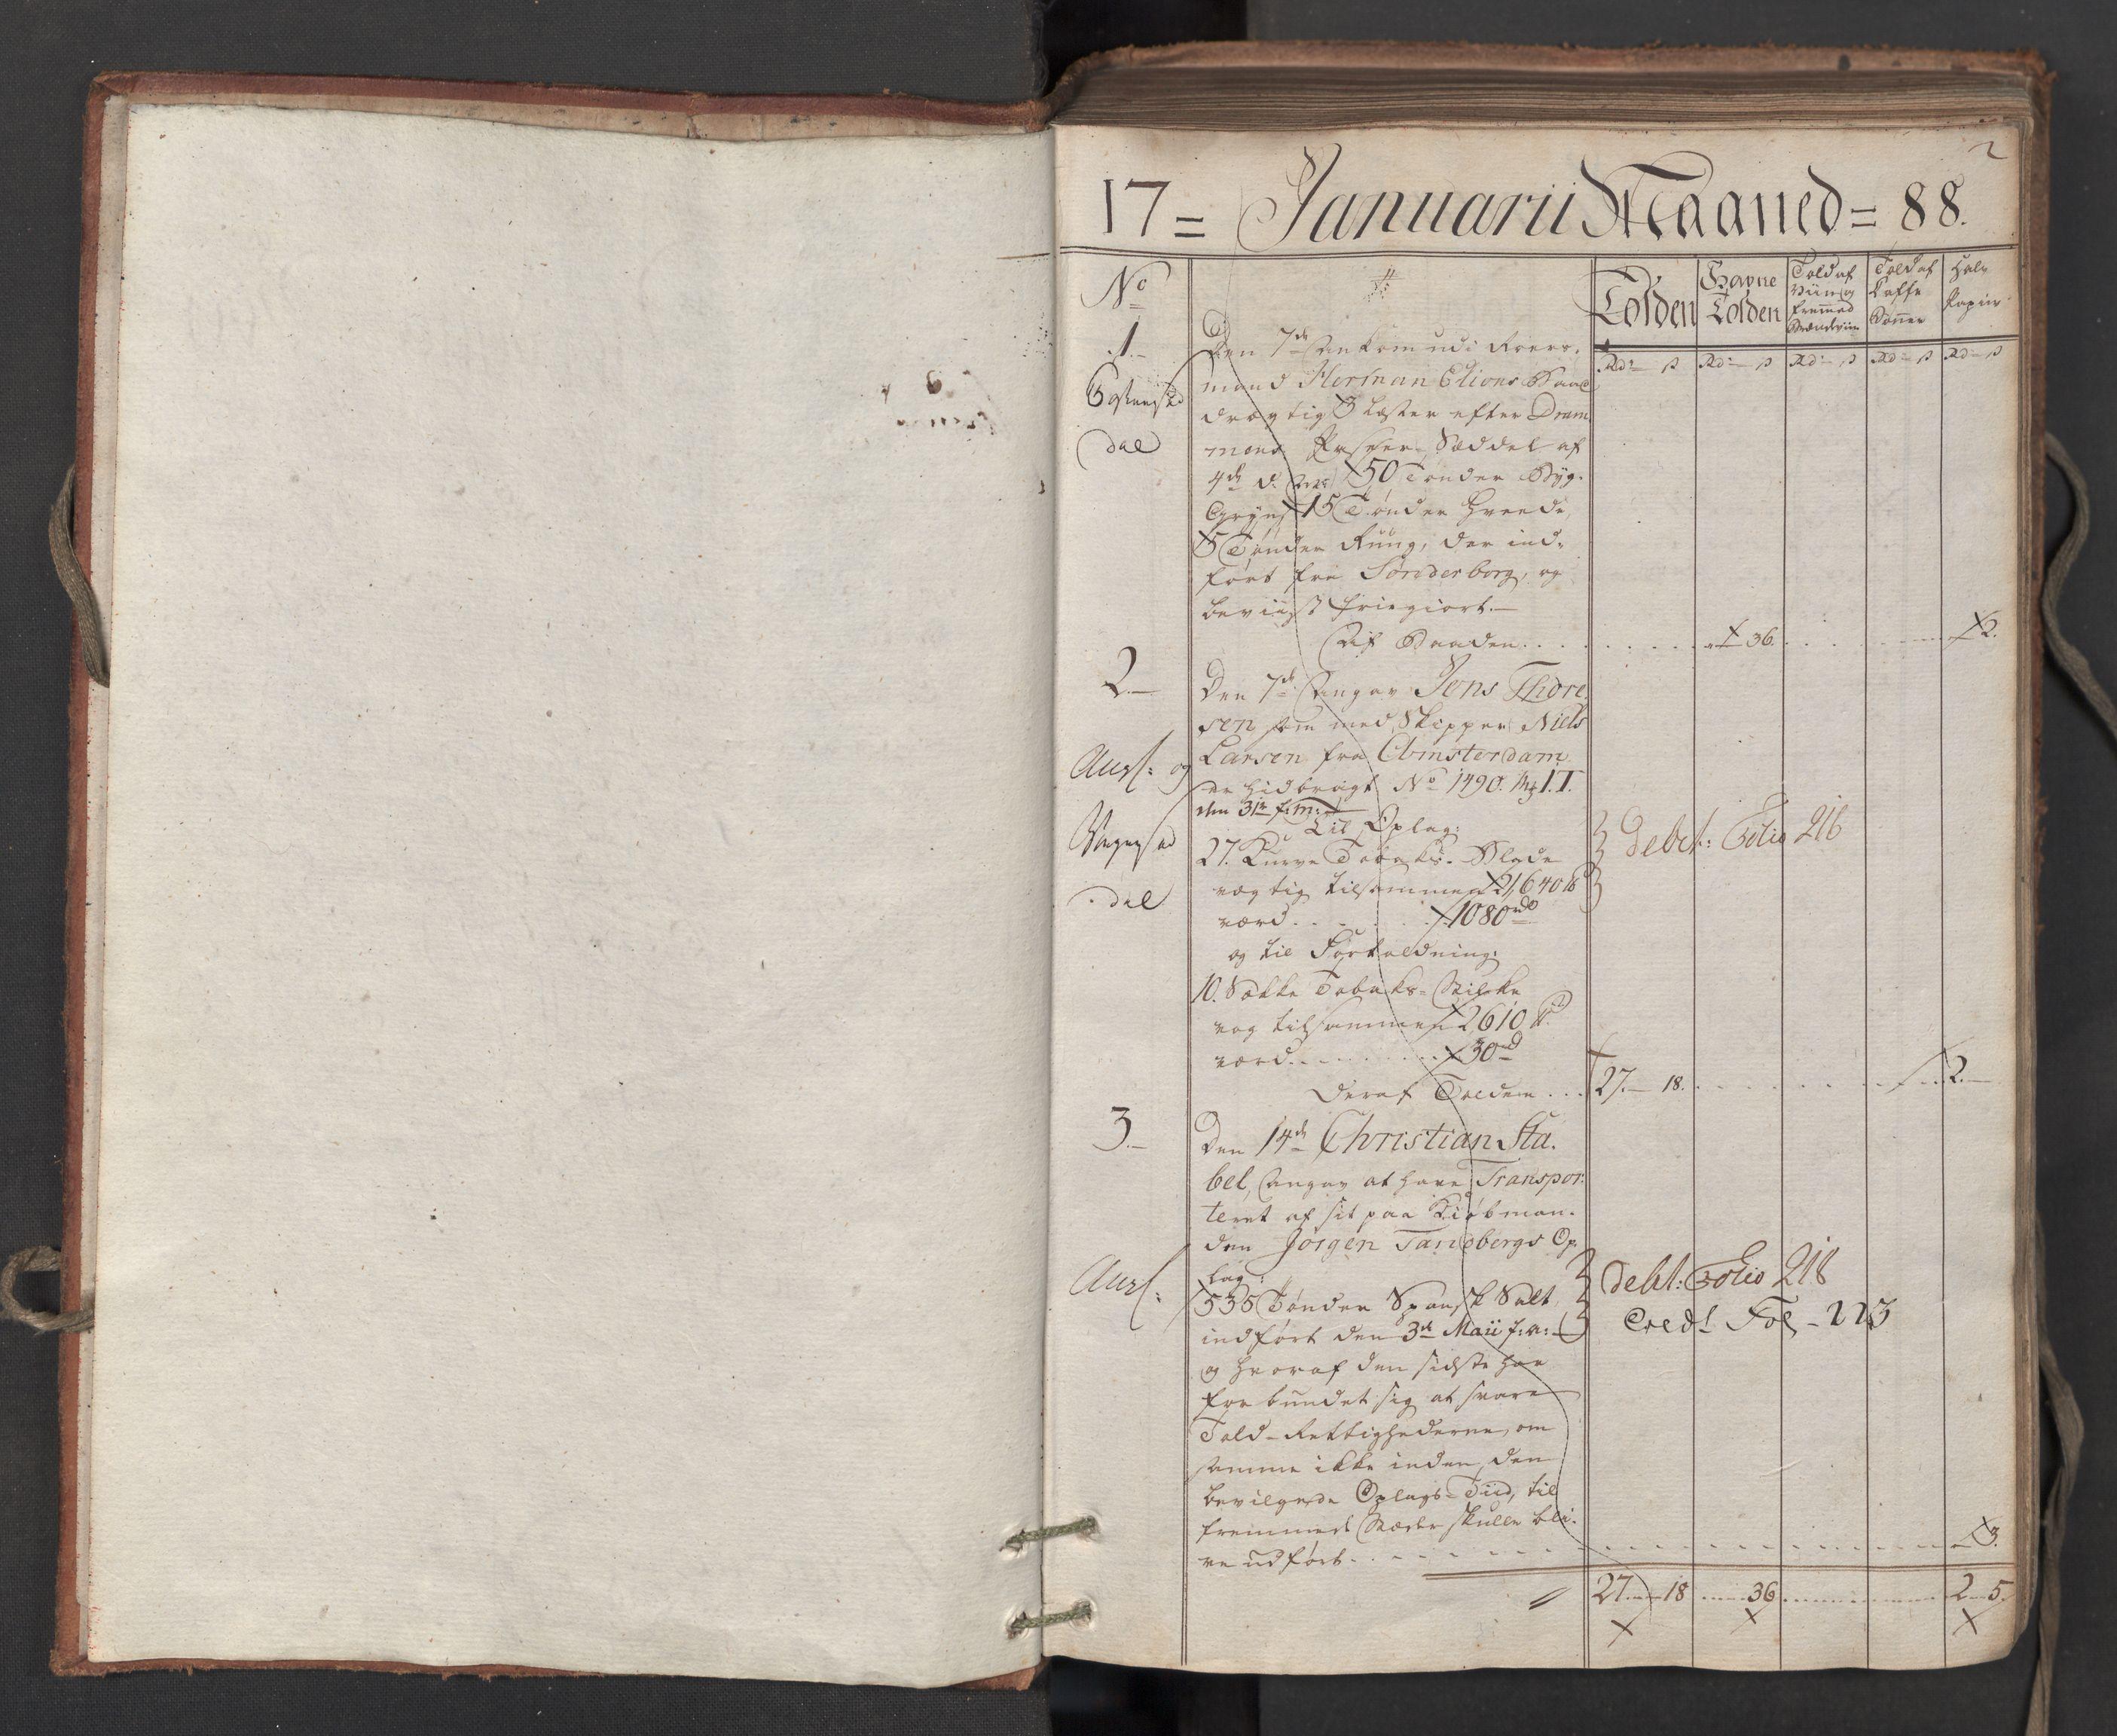 RA, Generaltollkammeret, tollregnskaper, R06/L0173: Tollregnskaper Kristiania, 1788, s. 1b-2a